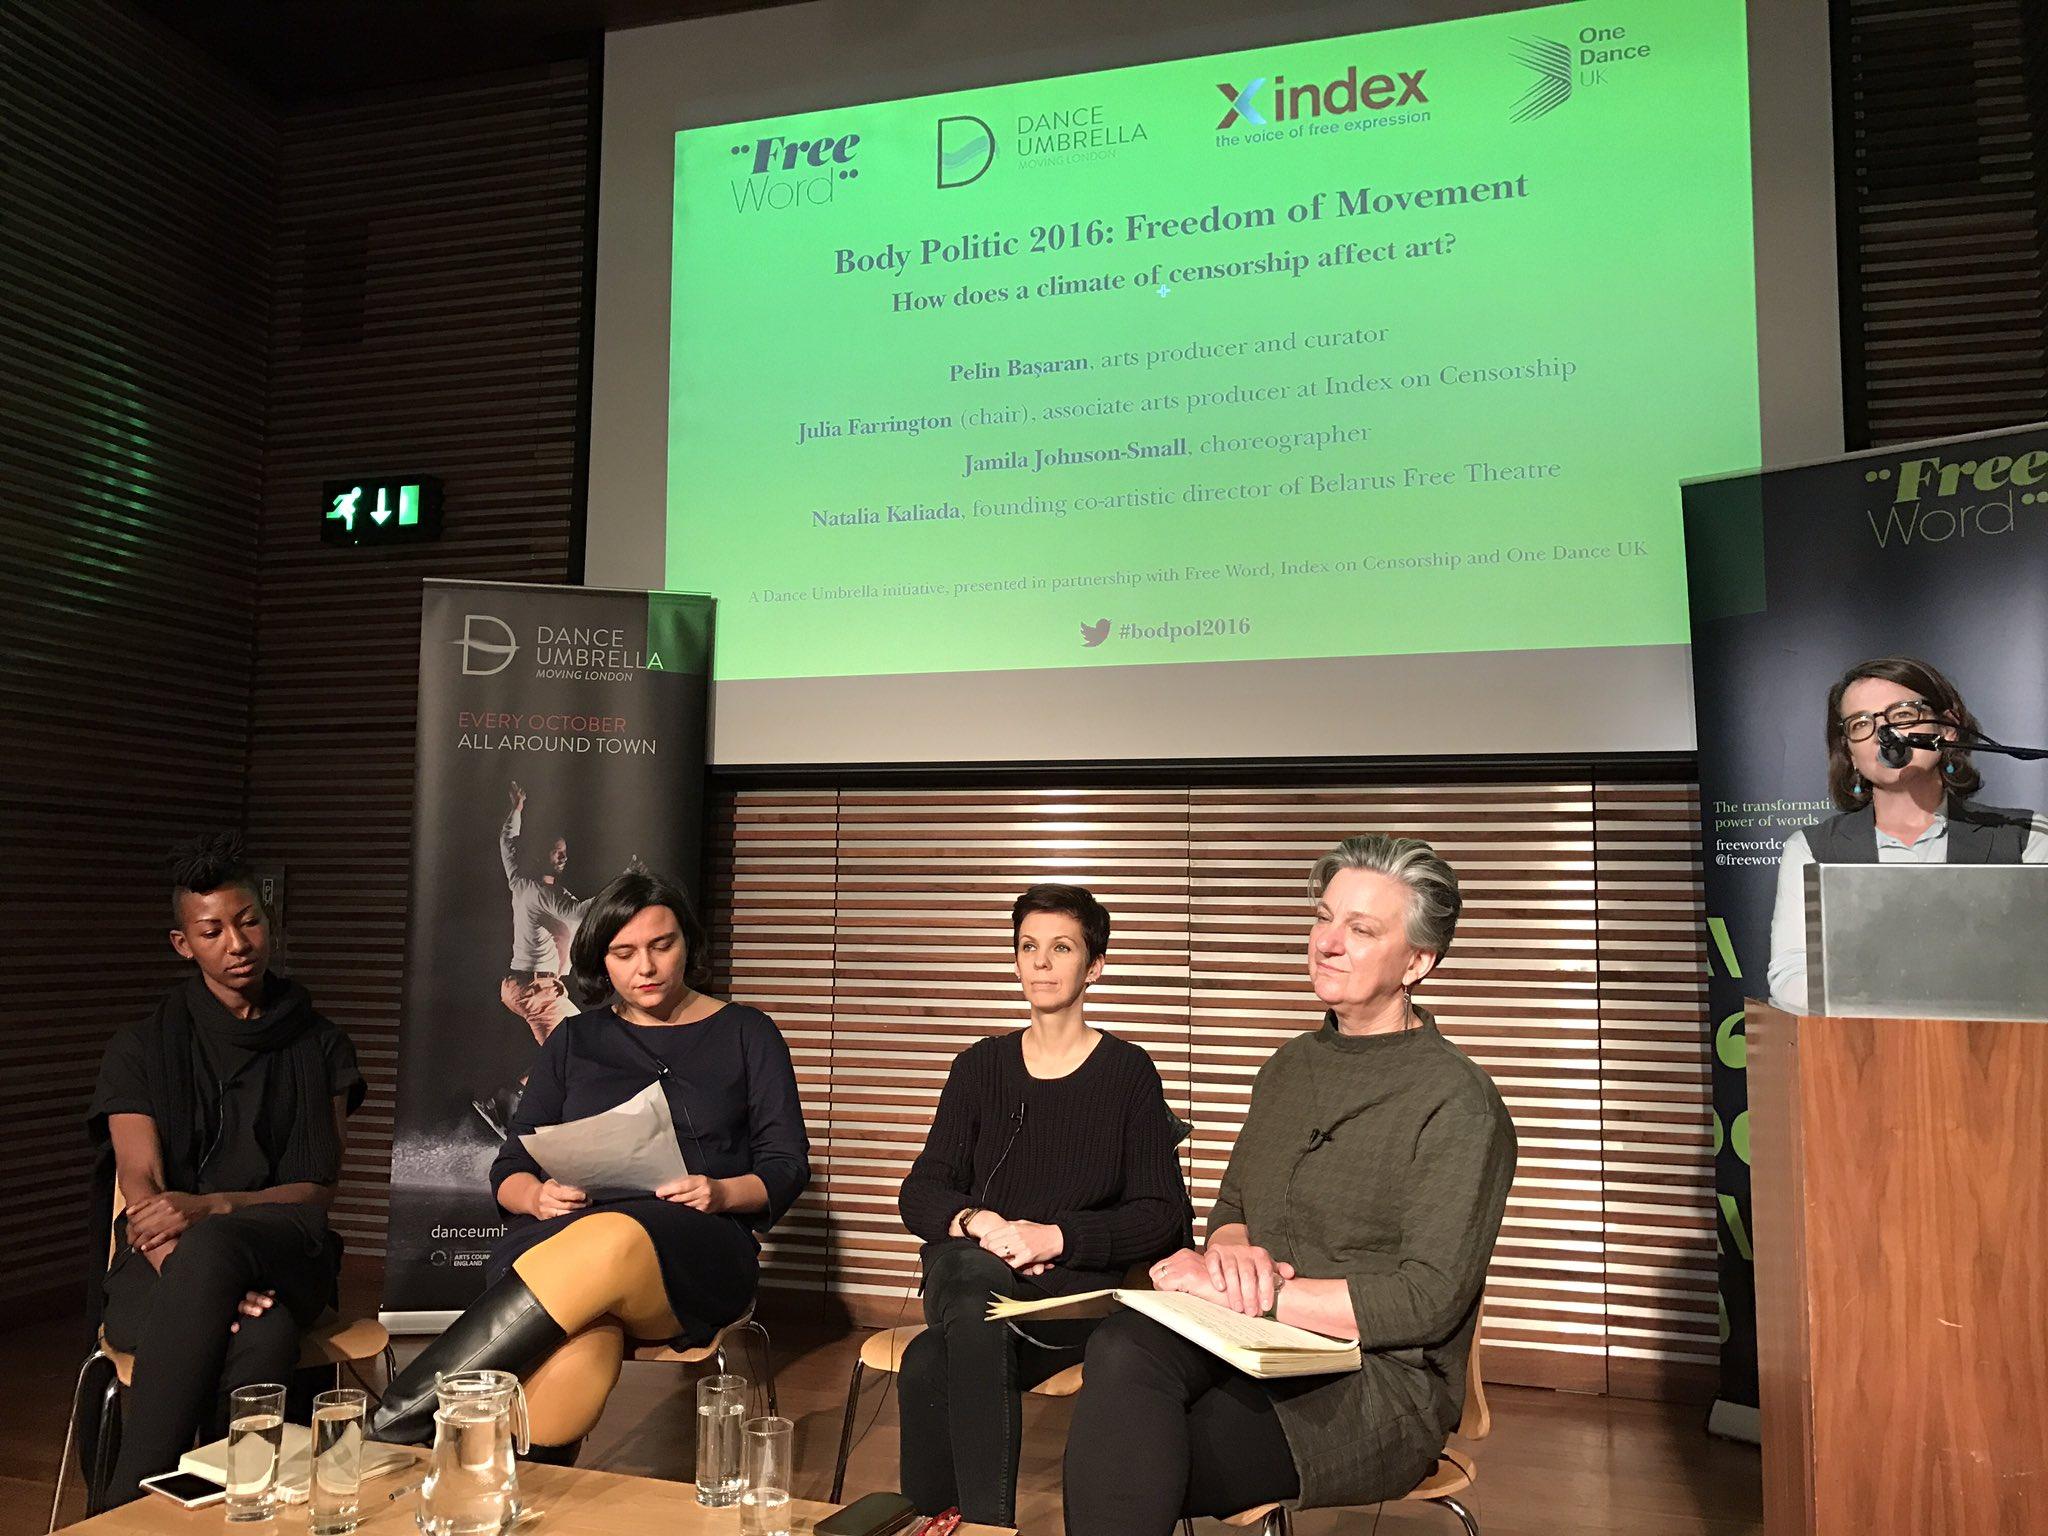 AD Emma introduces Chair-Julia Farrington & panelists:Jamila Johnson-Small, Natalia Kaliada & Pelin Basaran #bodpol16 @FreeWordCentre https://t.co/YTWO42fhRY